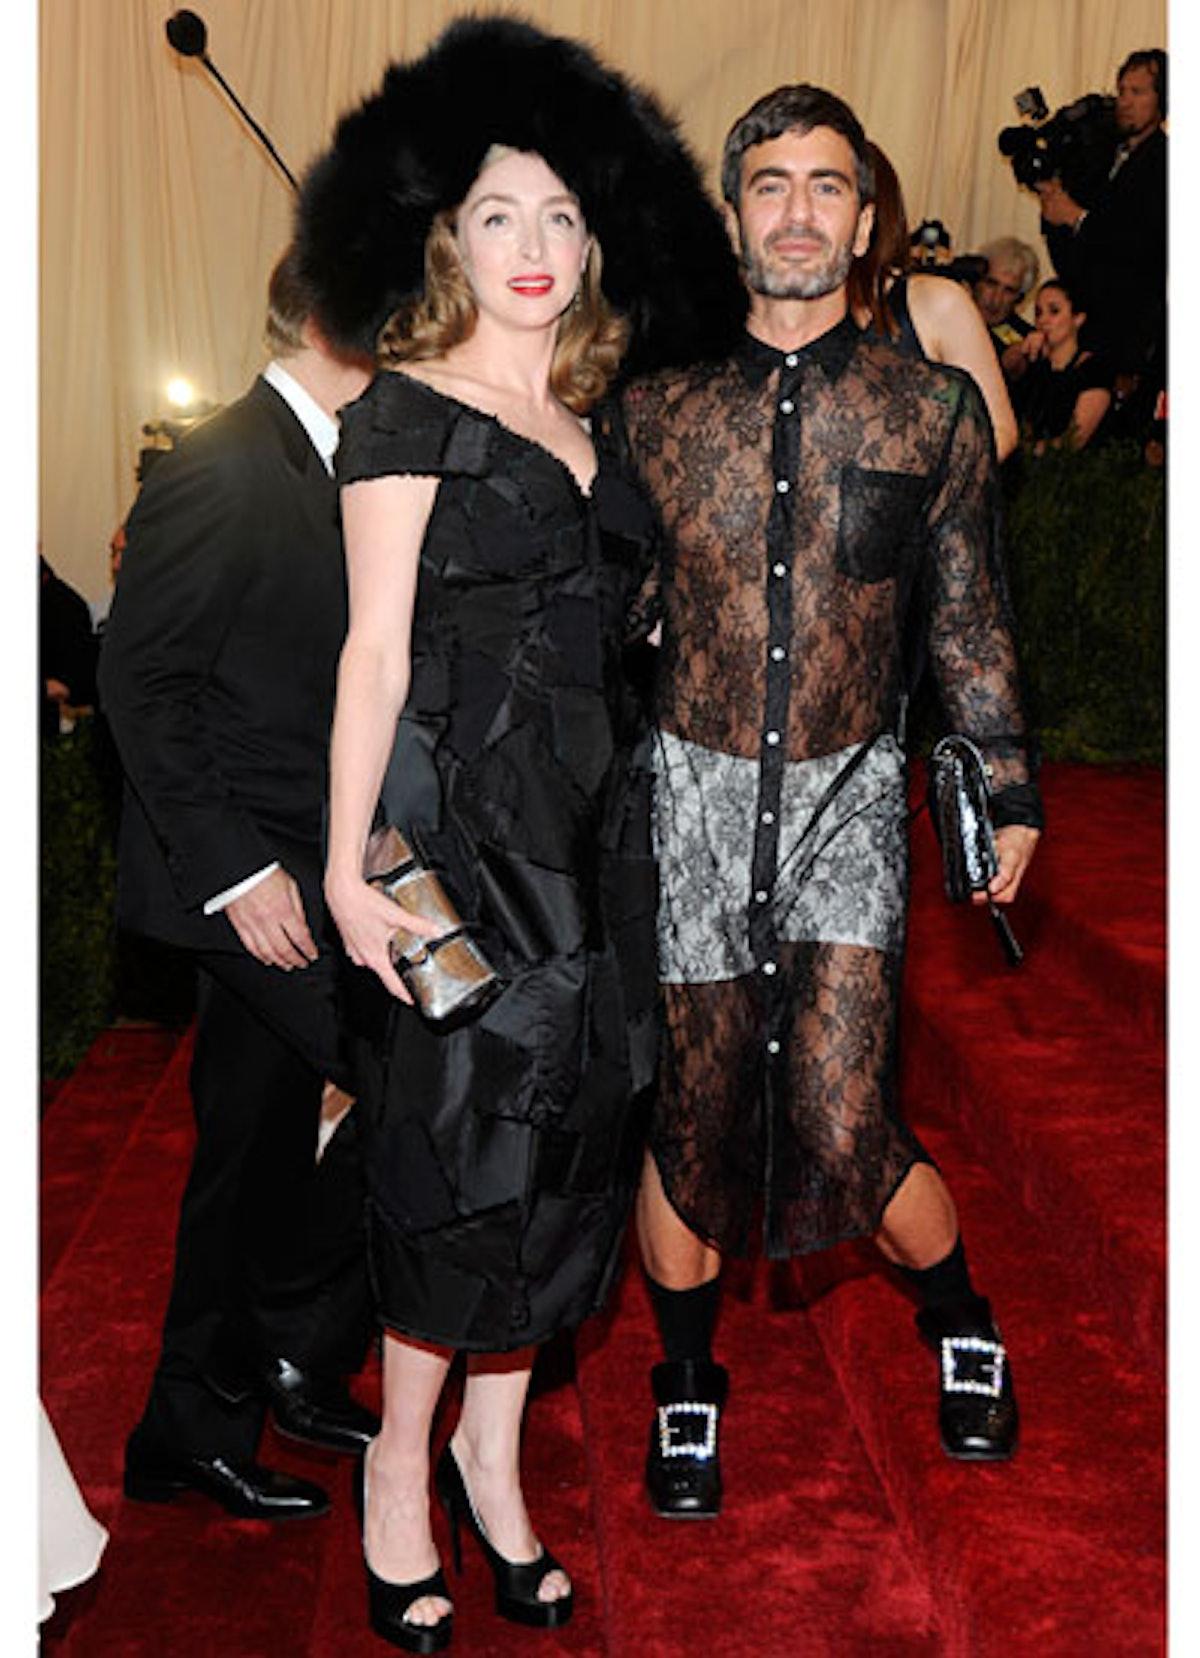 pass-met-costume-institute-gala-2012-63-v.jpg